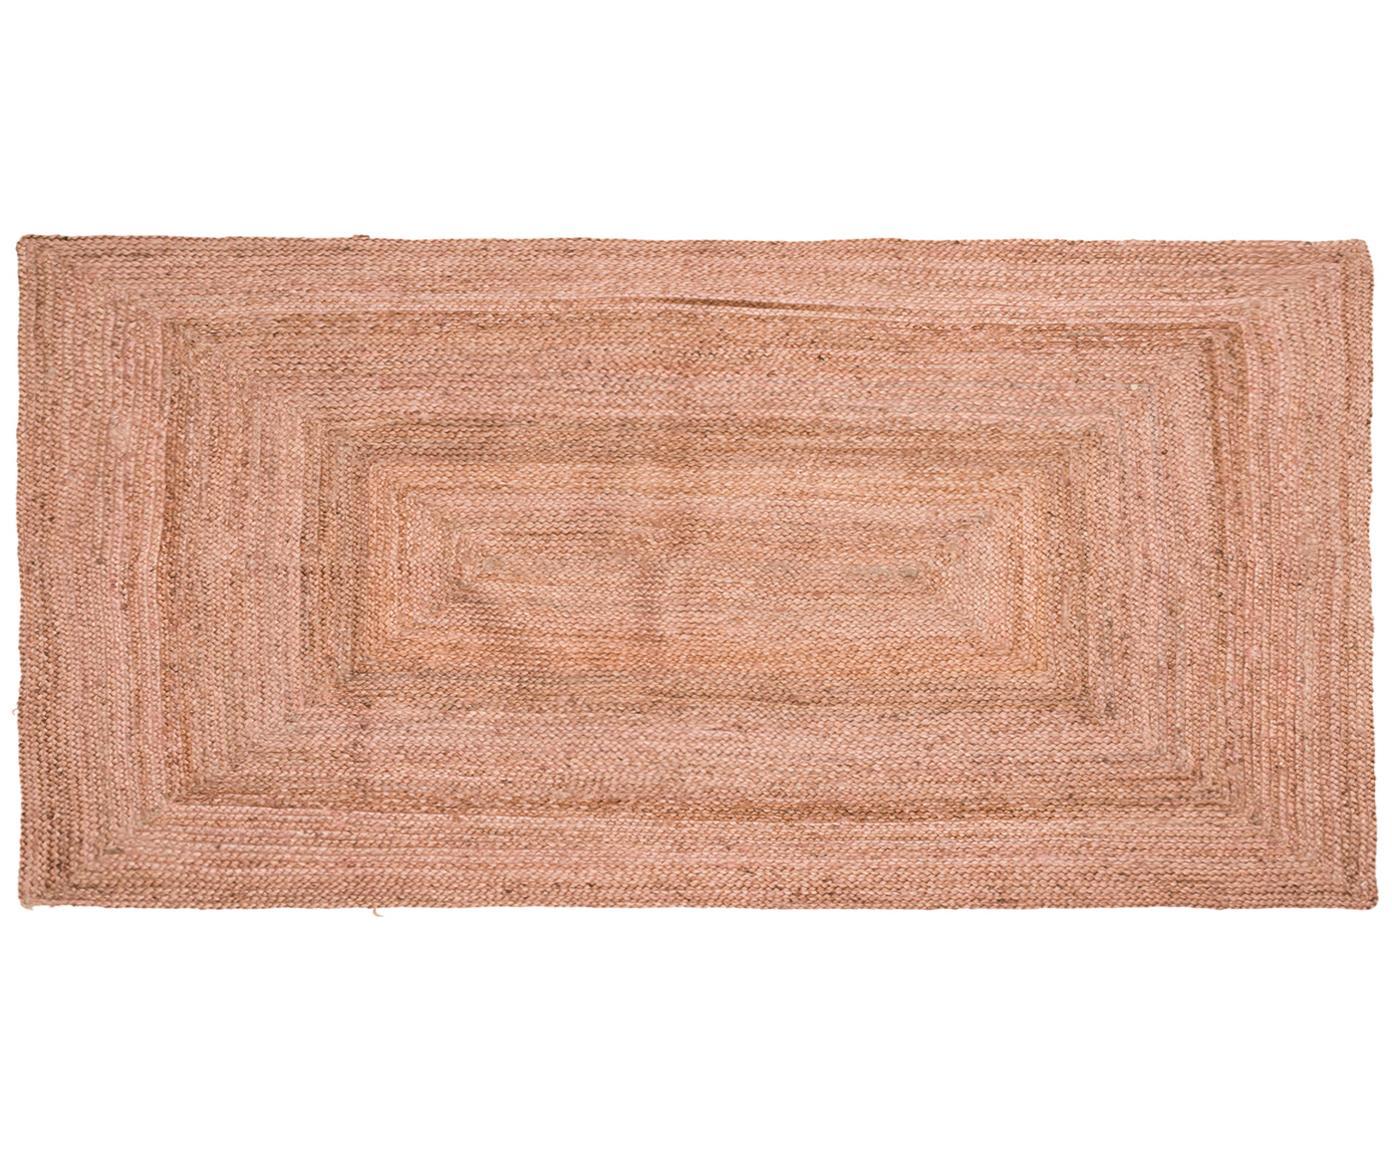 Alfombra de yute Pampas, Yute, Rosa pálido, An 60 x L 120 cm (Tamaño XS)